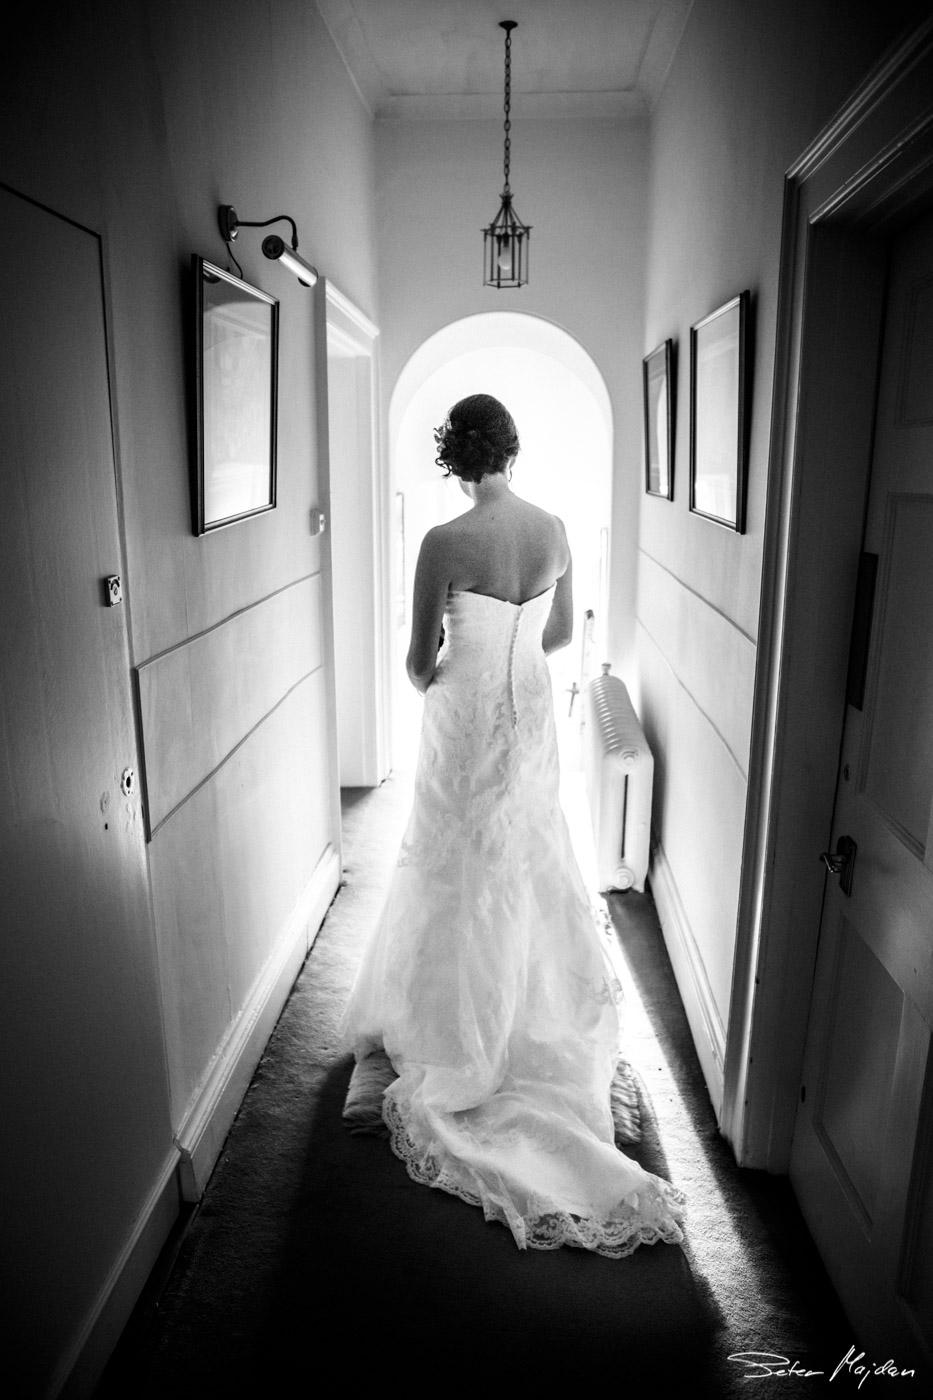 east-bridgford-hill-wedding-photography-22.jpg